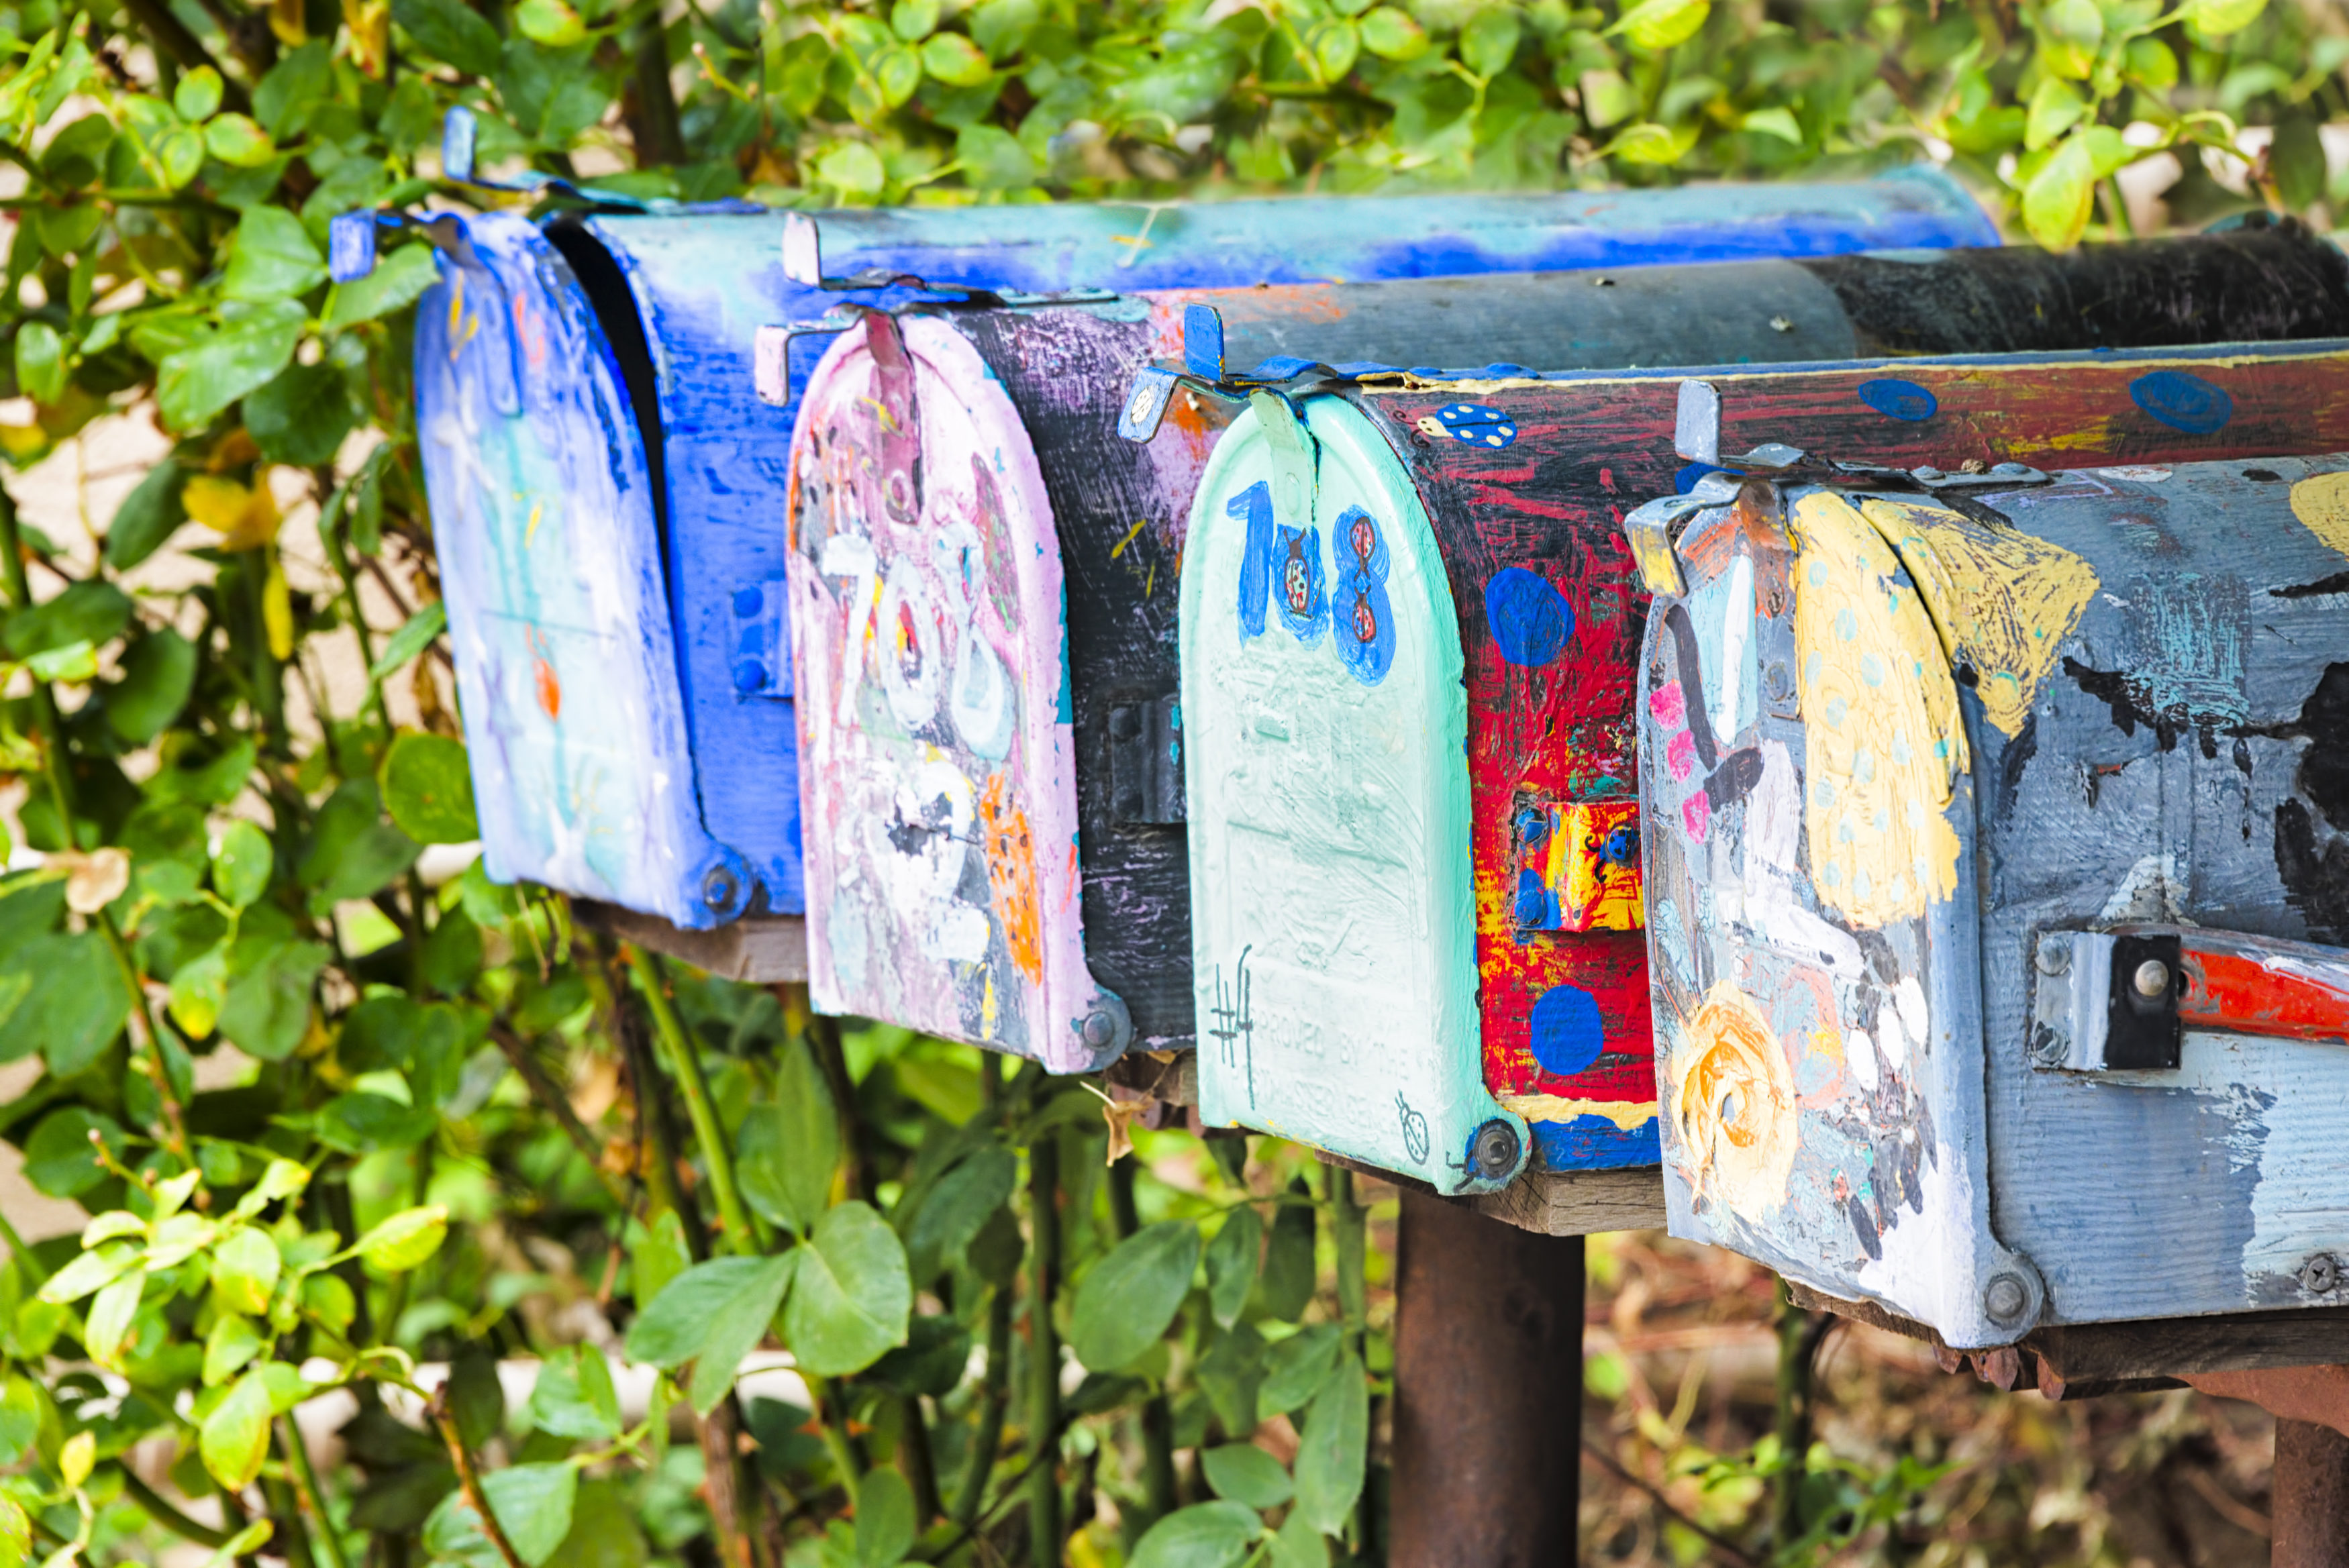 florida-mail-ballots-mailboxes-3500x2337.jpeg